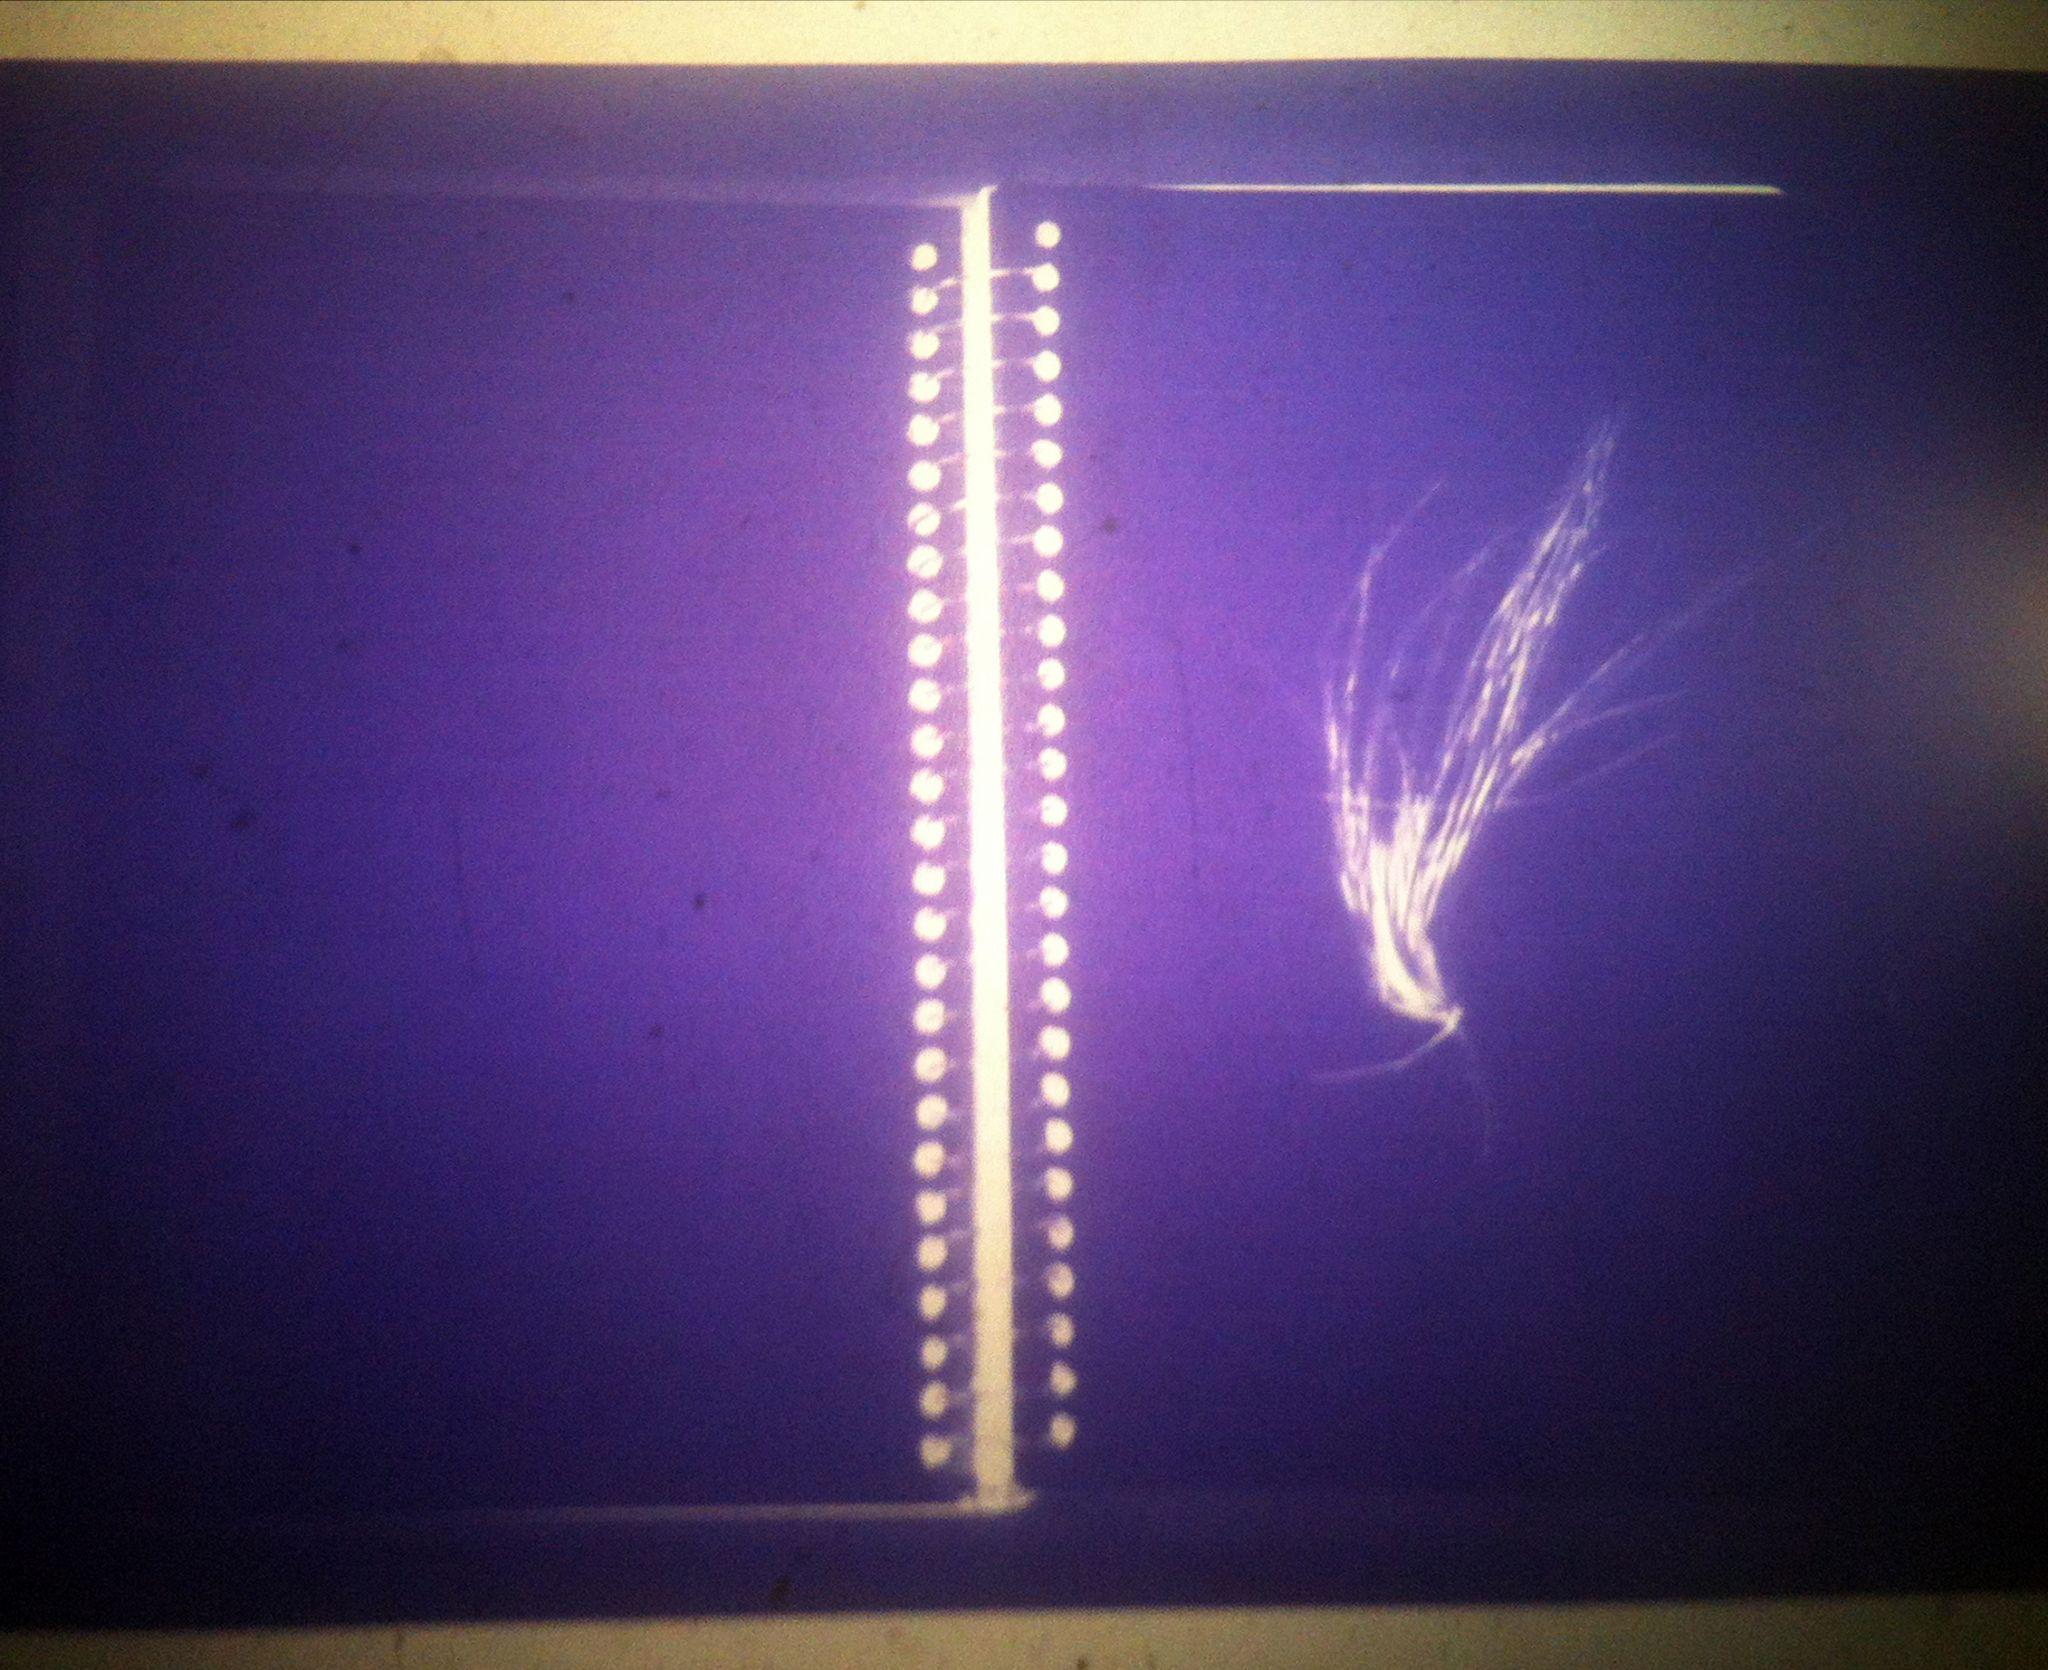 microfilme_caderno